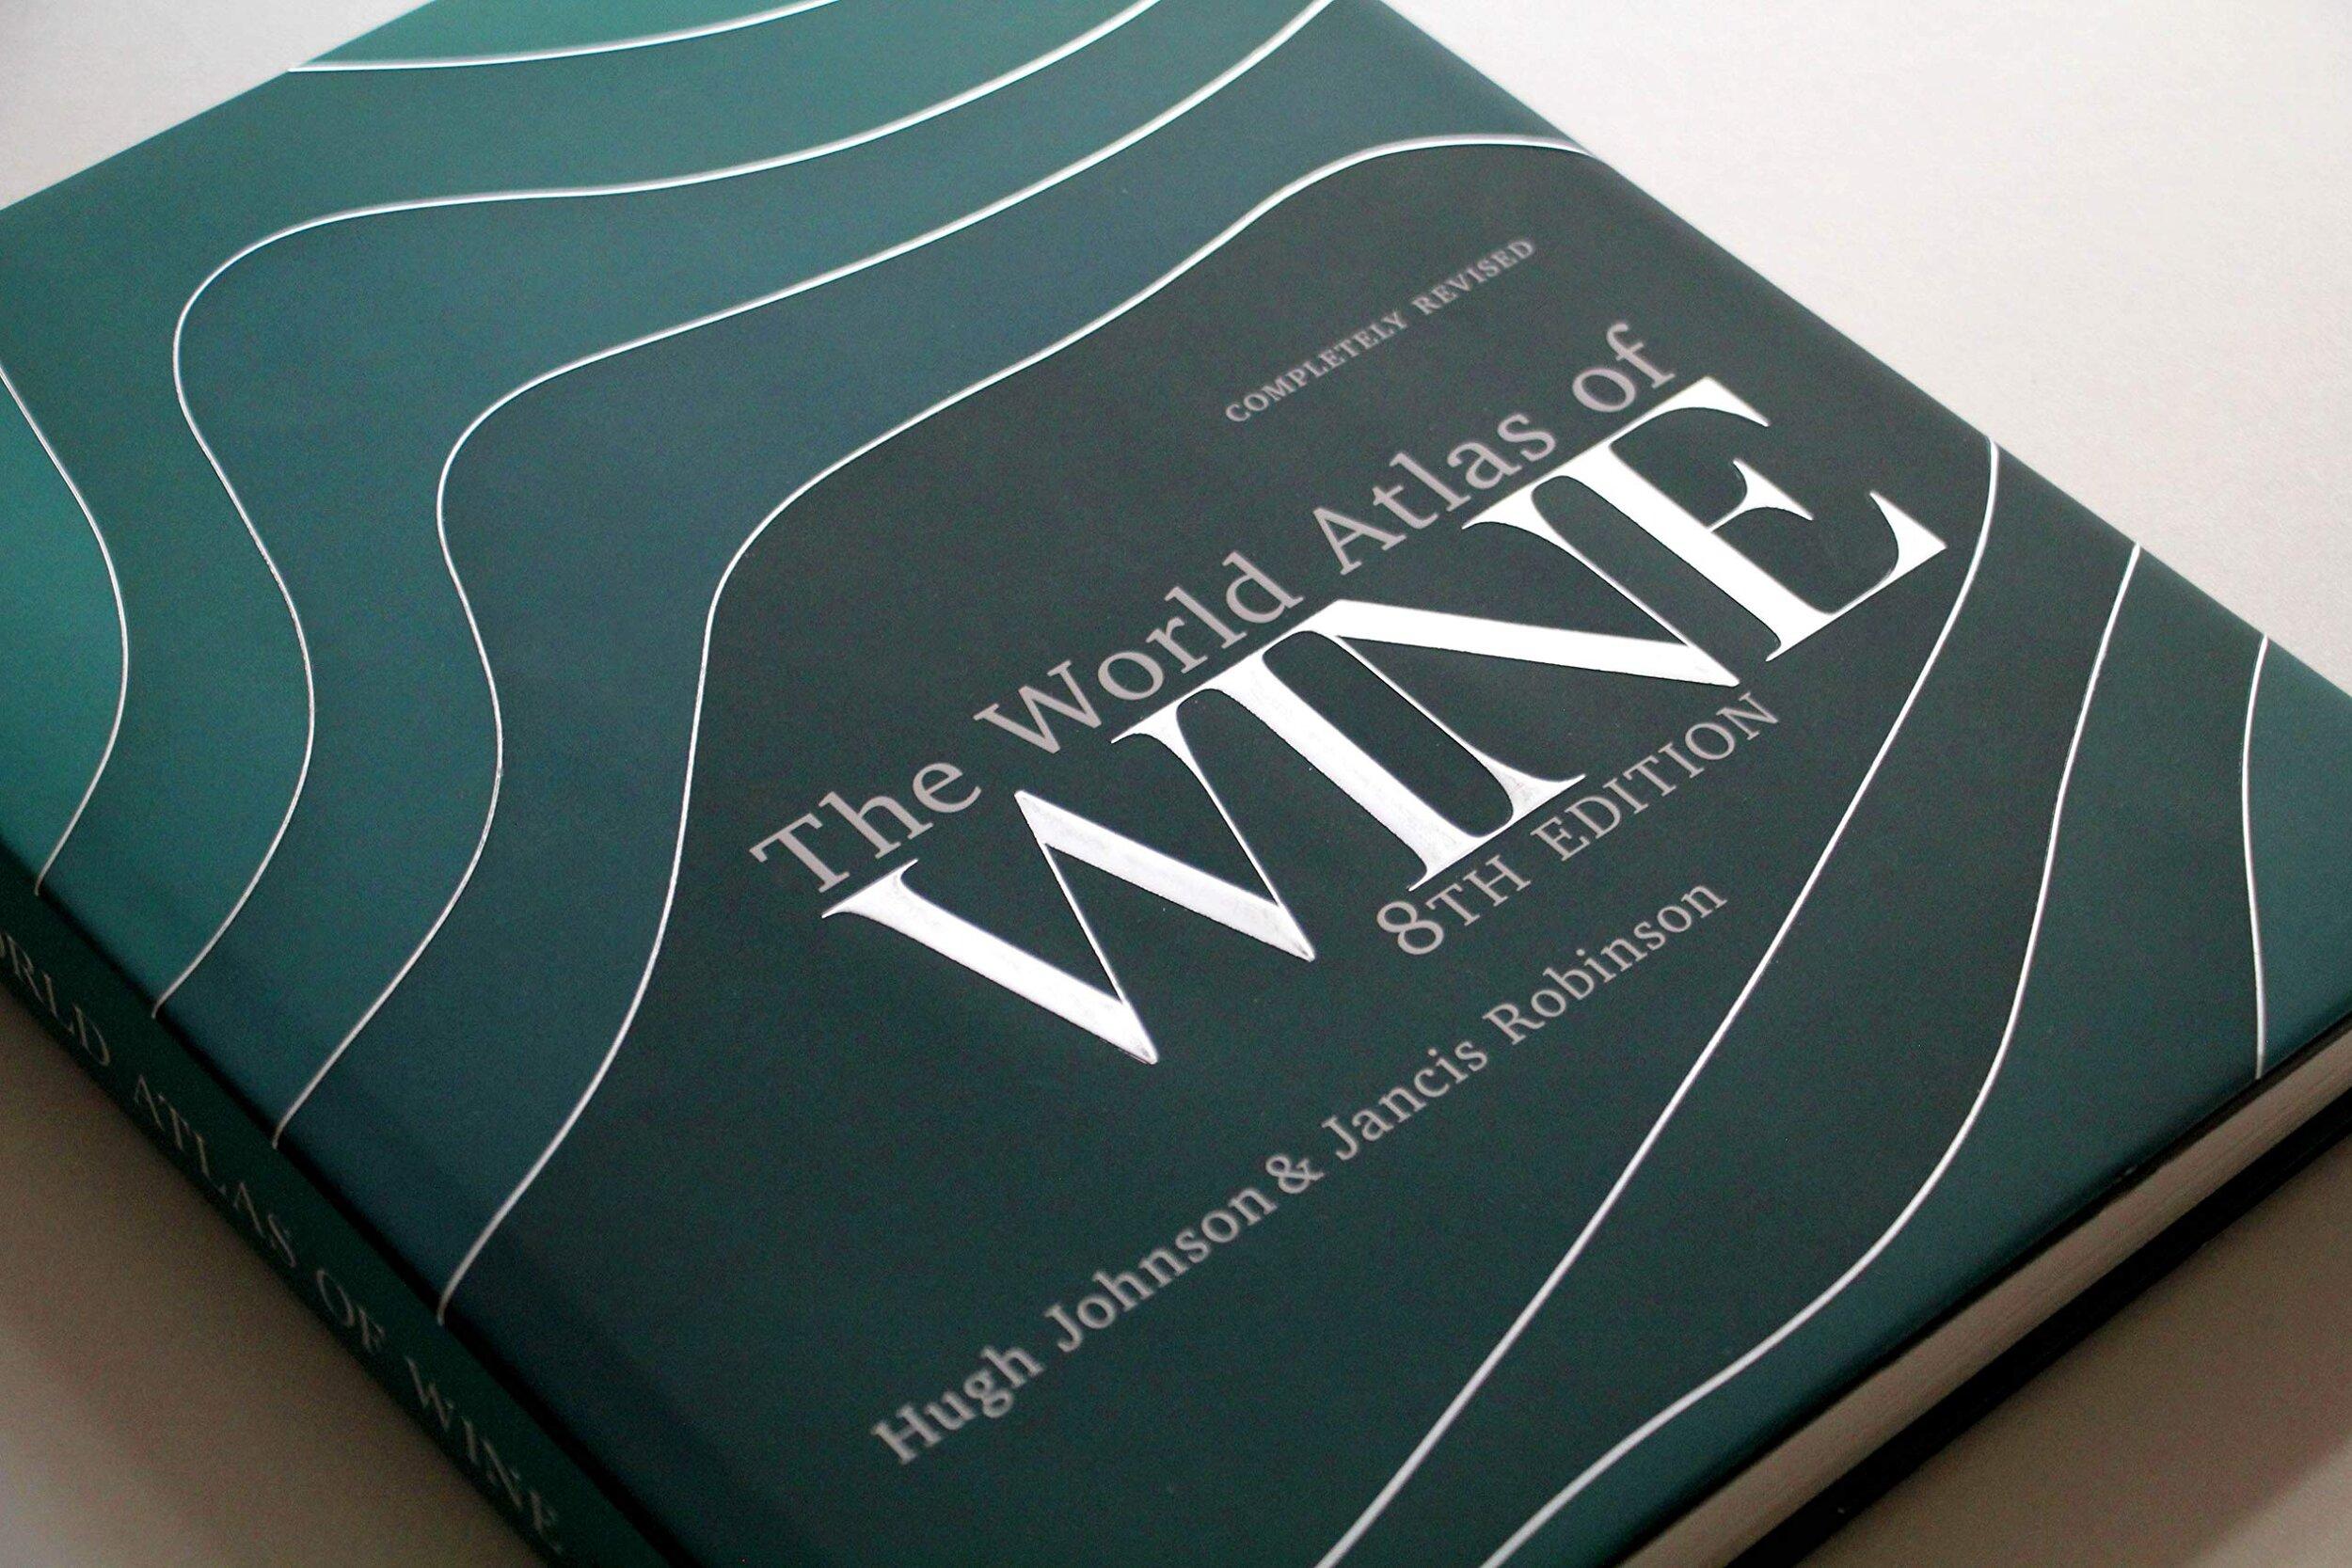 wine atlas jackman robinson.jpg